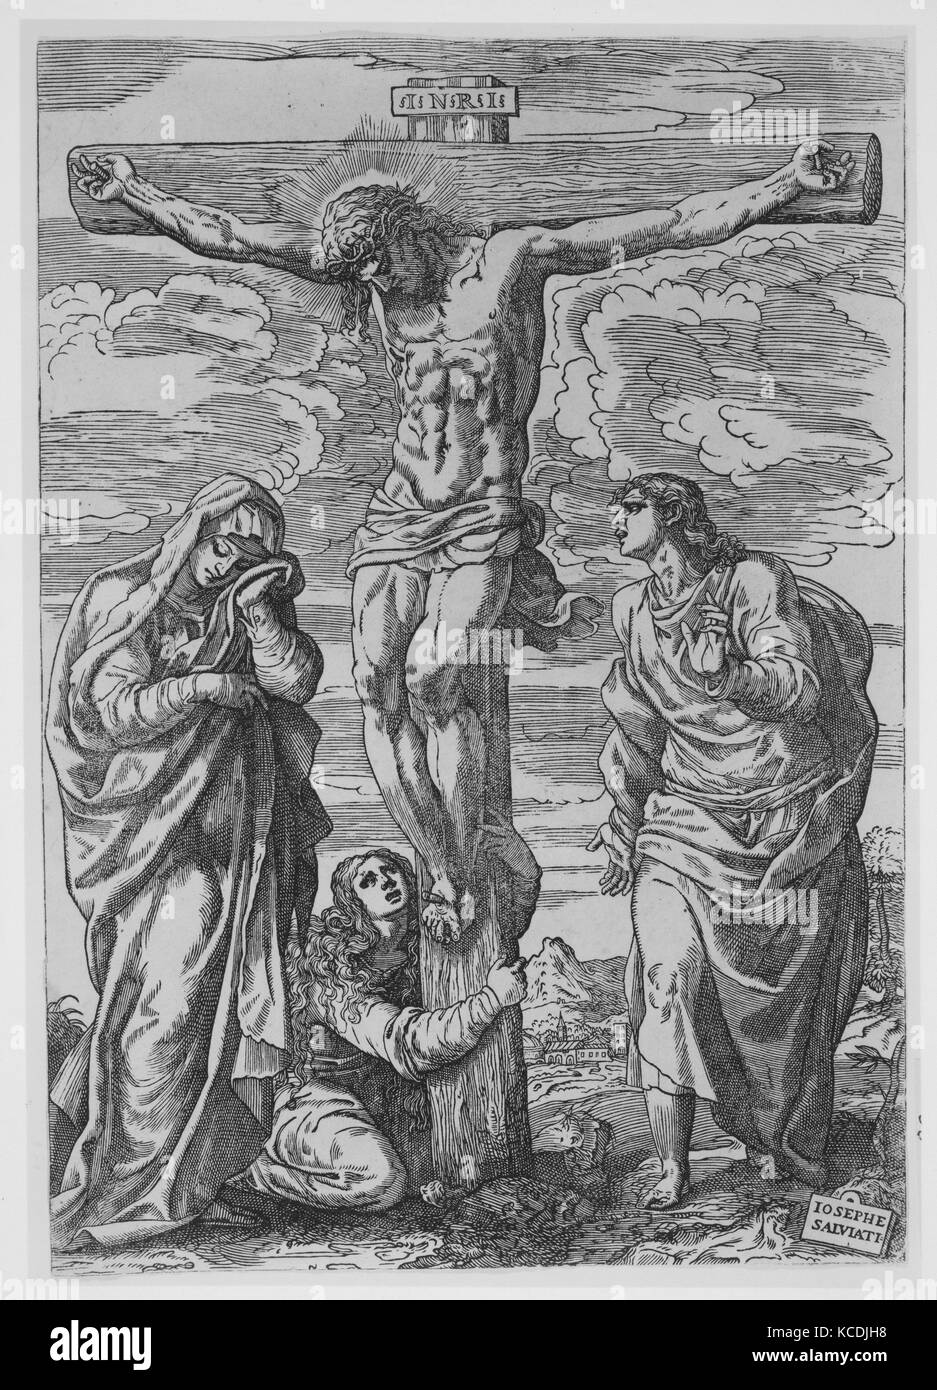 Crucifixion, 1556, Woodcut, Sheet: 12 3/16 × 8 3/8 in. (31 × 21.2 cm), Prints, Giuseppe Salviati (Giuseppe - Stock Image